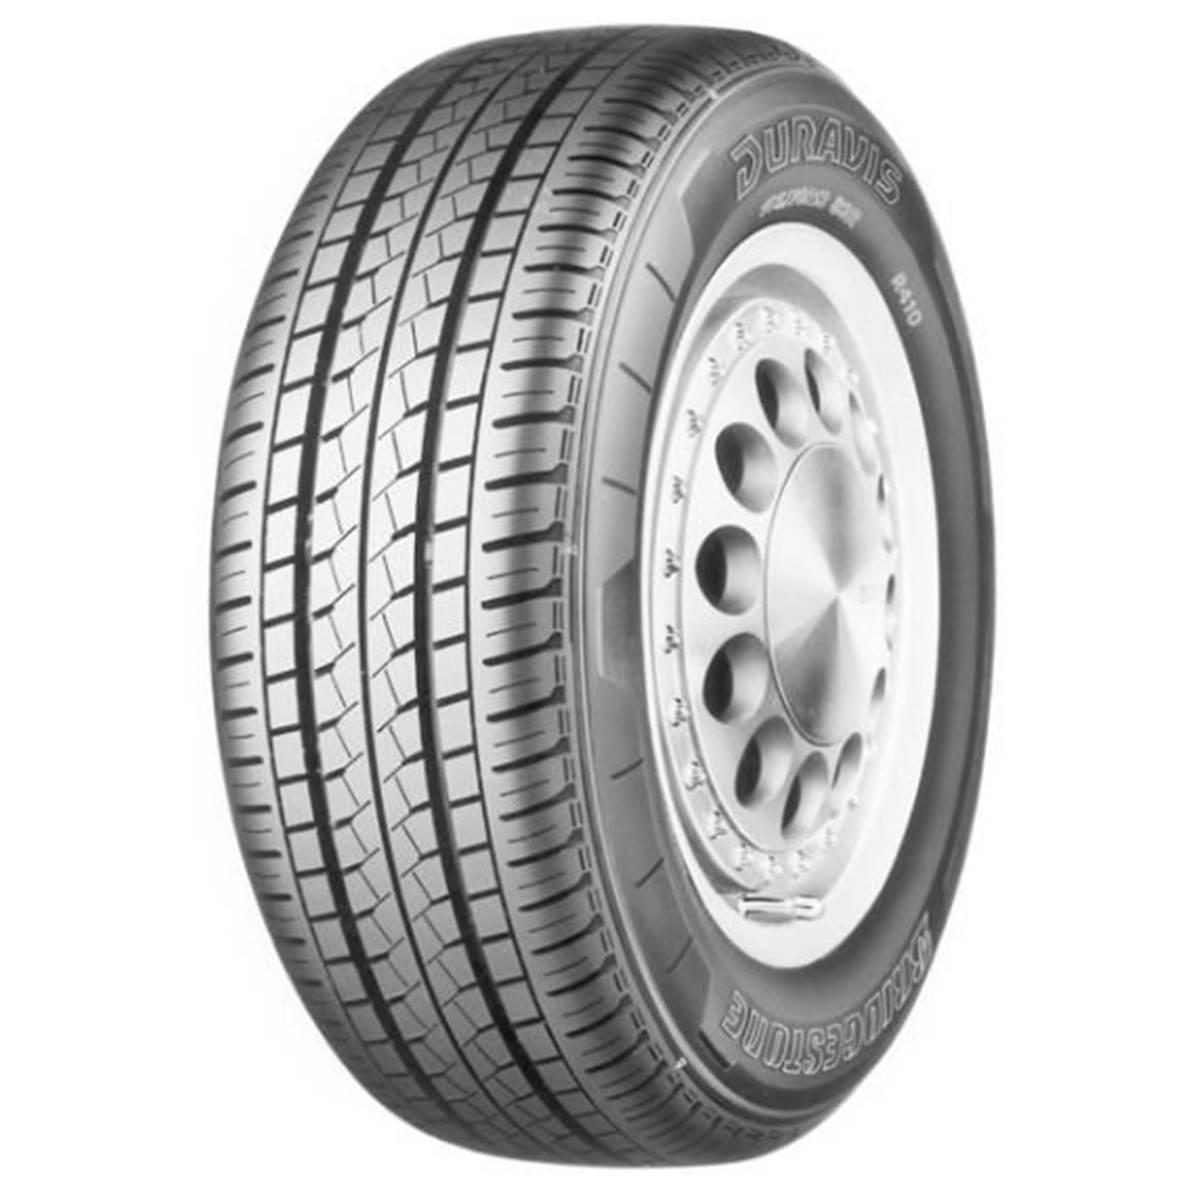 Pneu Camionnette Bridgestone 195/65R16 100T Duravis R410